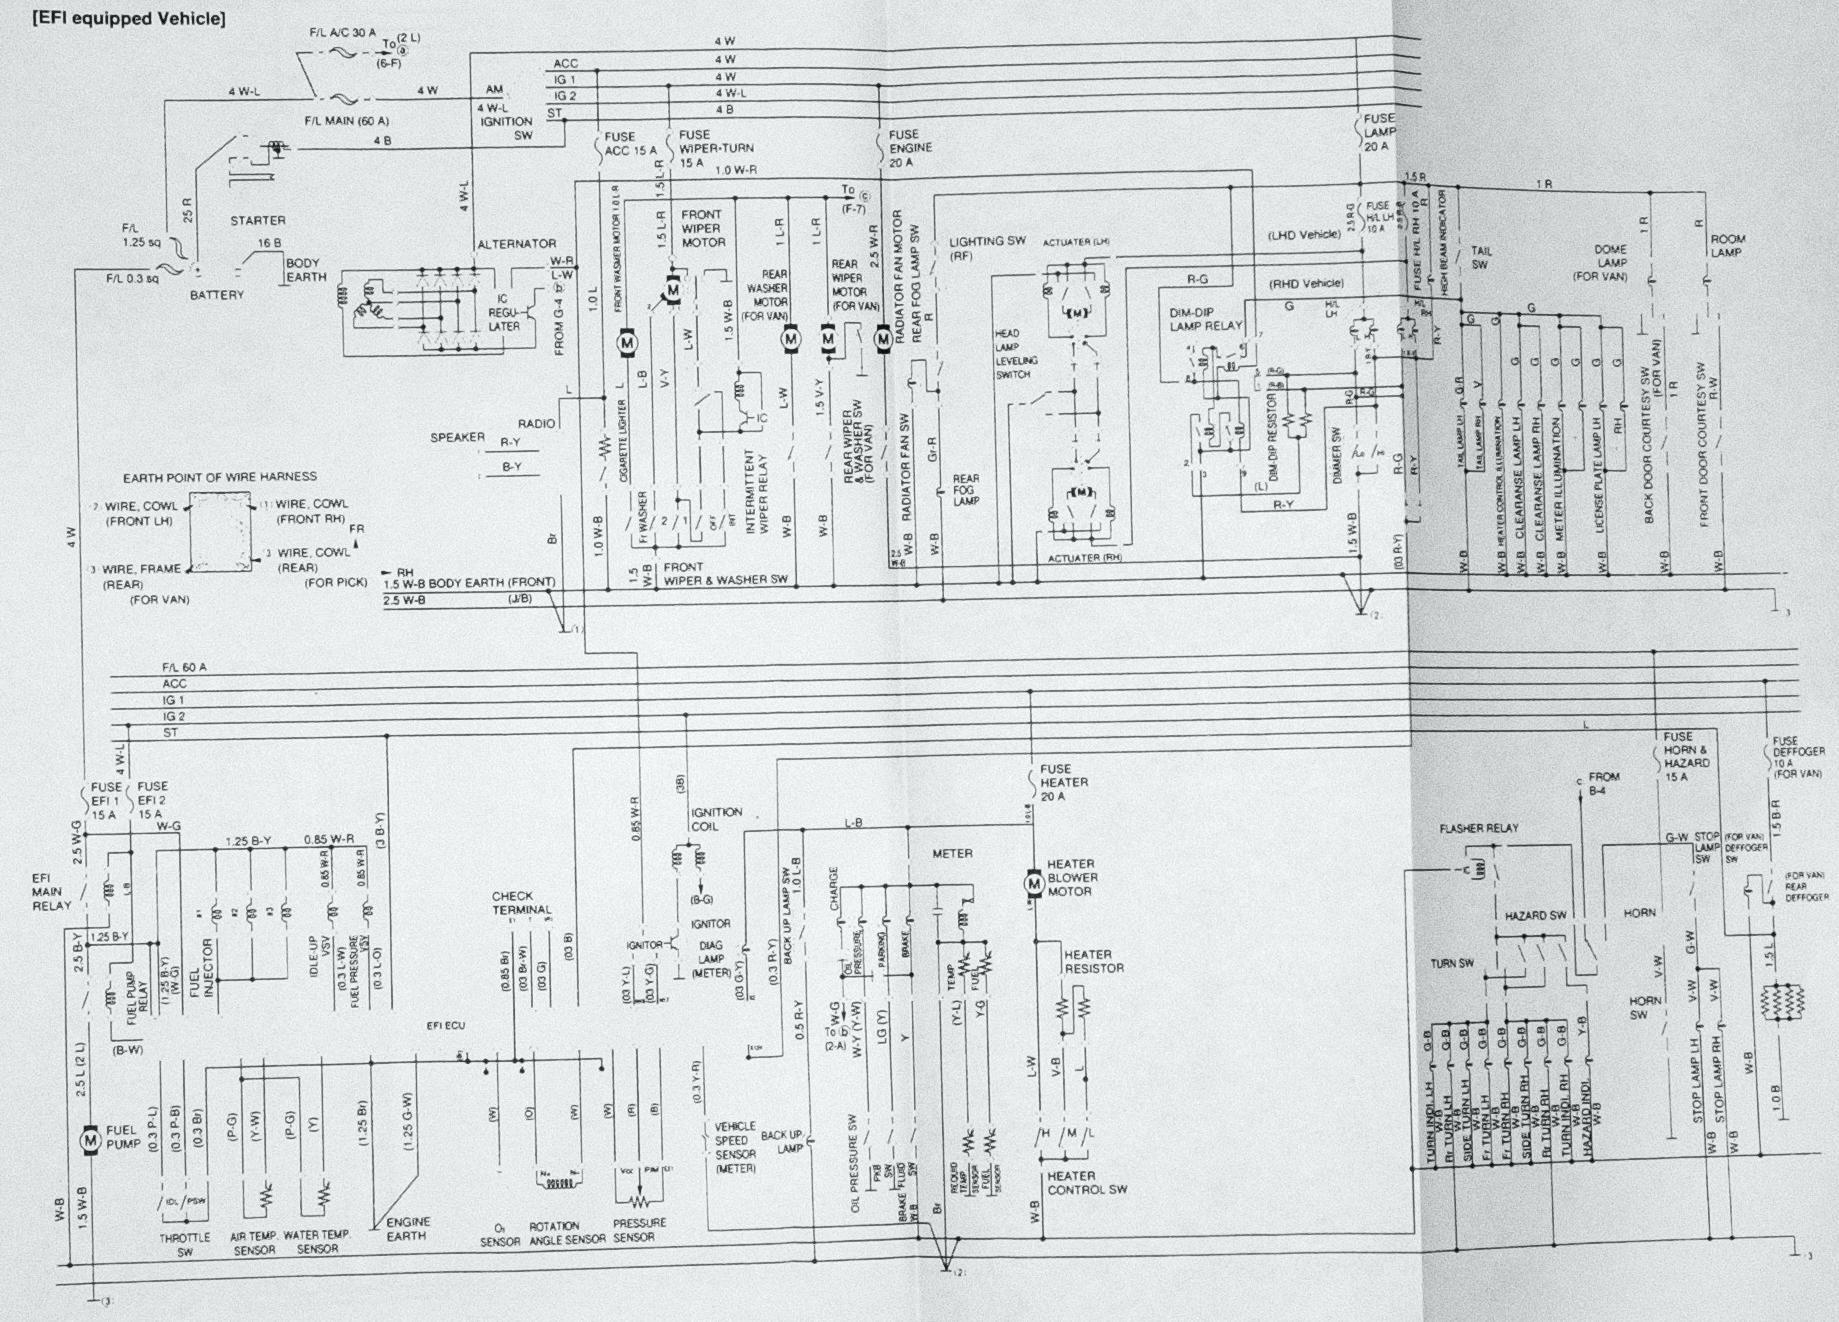 Taft Tractor Wiring Diagram Libraries Cat 627f Daihatsu Sirion Simple Diagramsdaihatsu L200 Schema Hijet